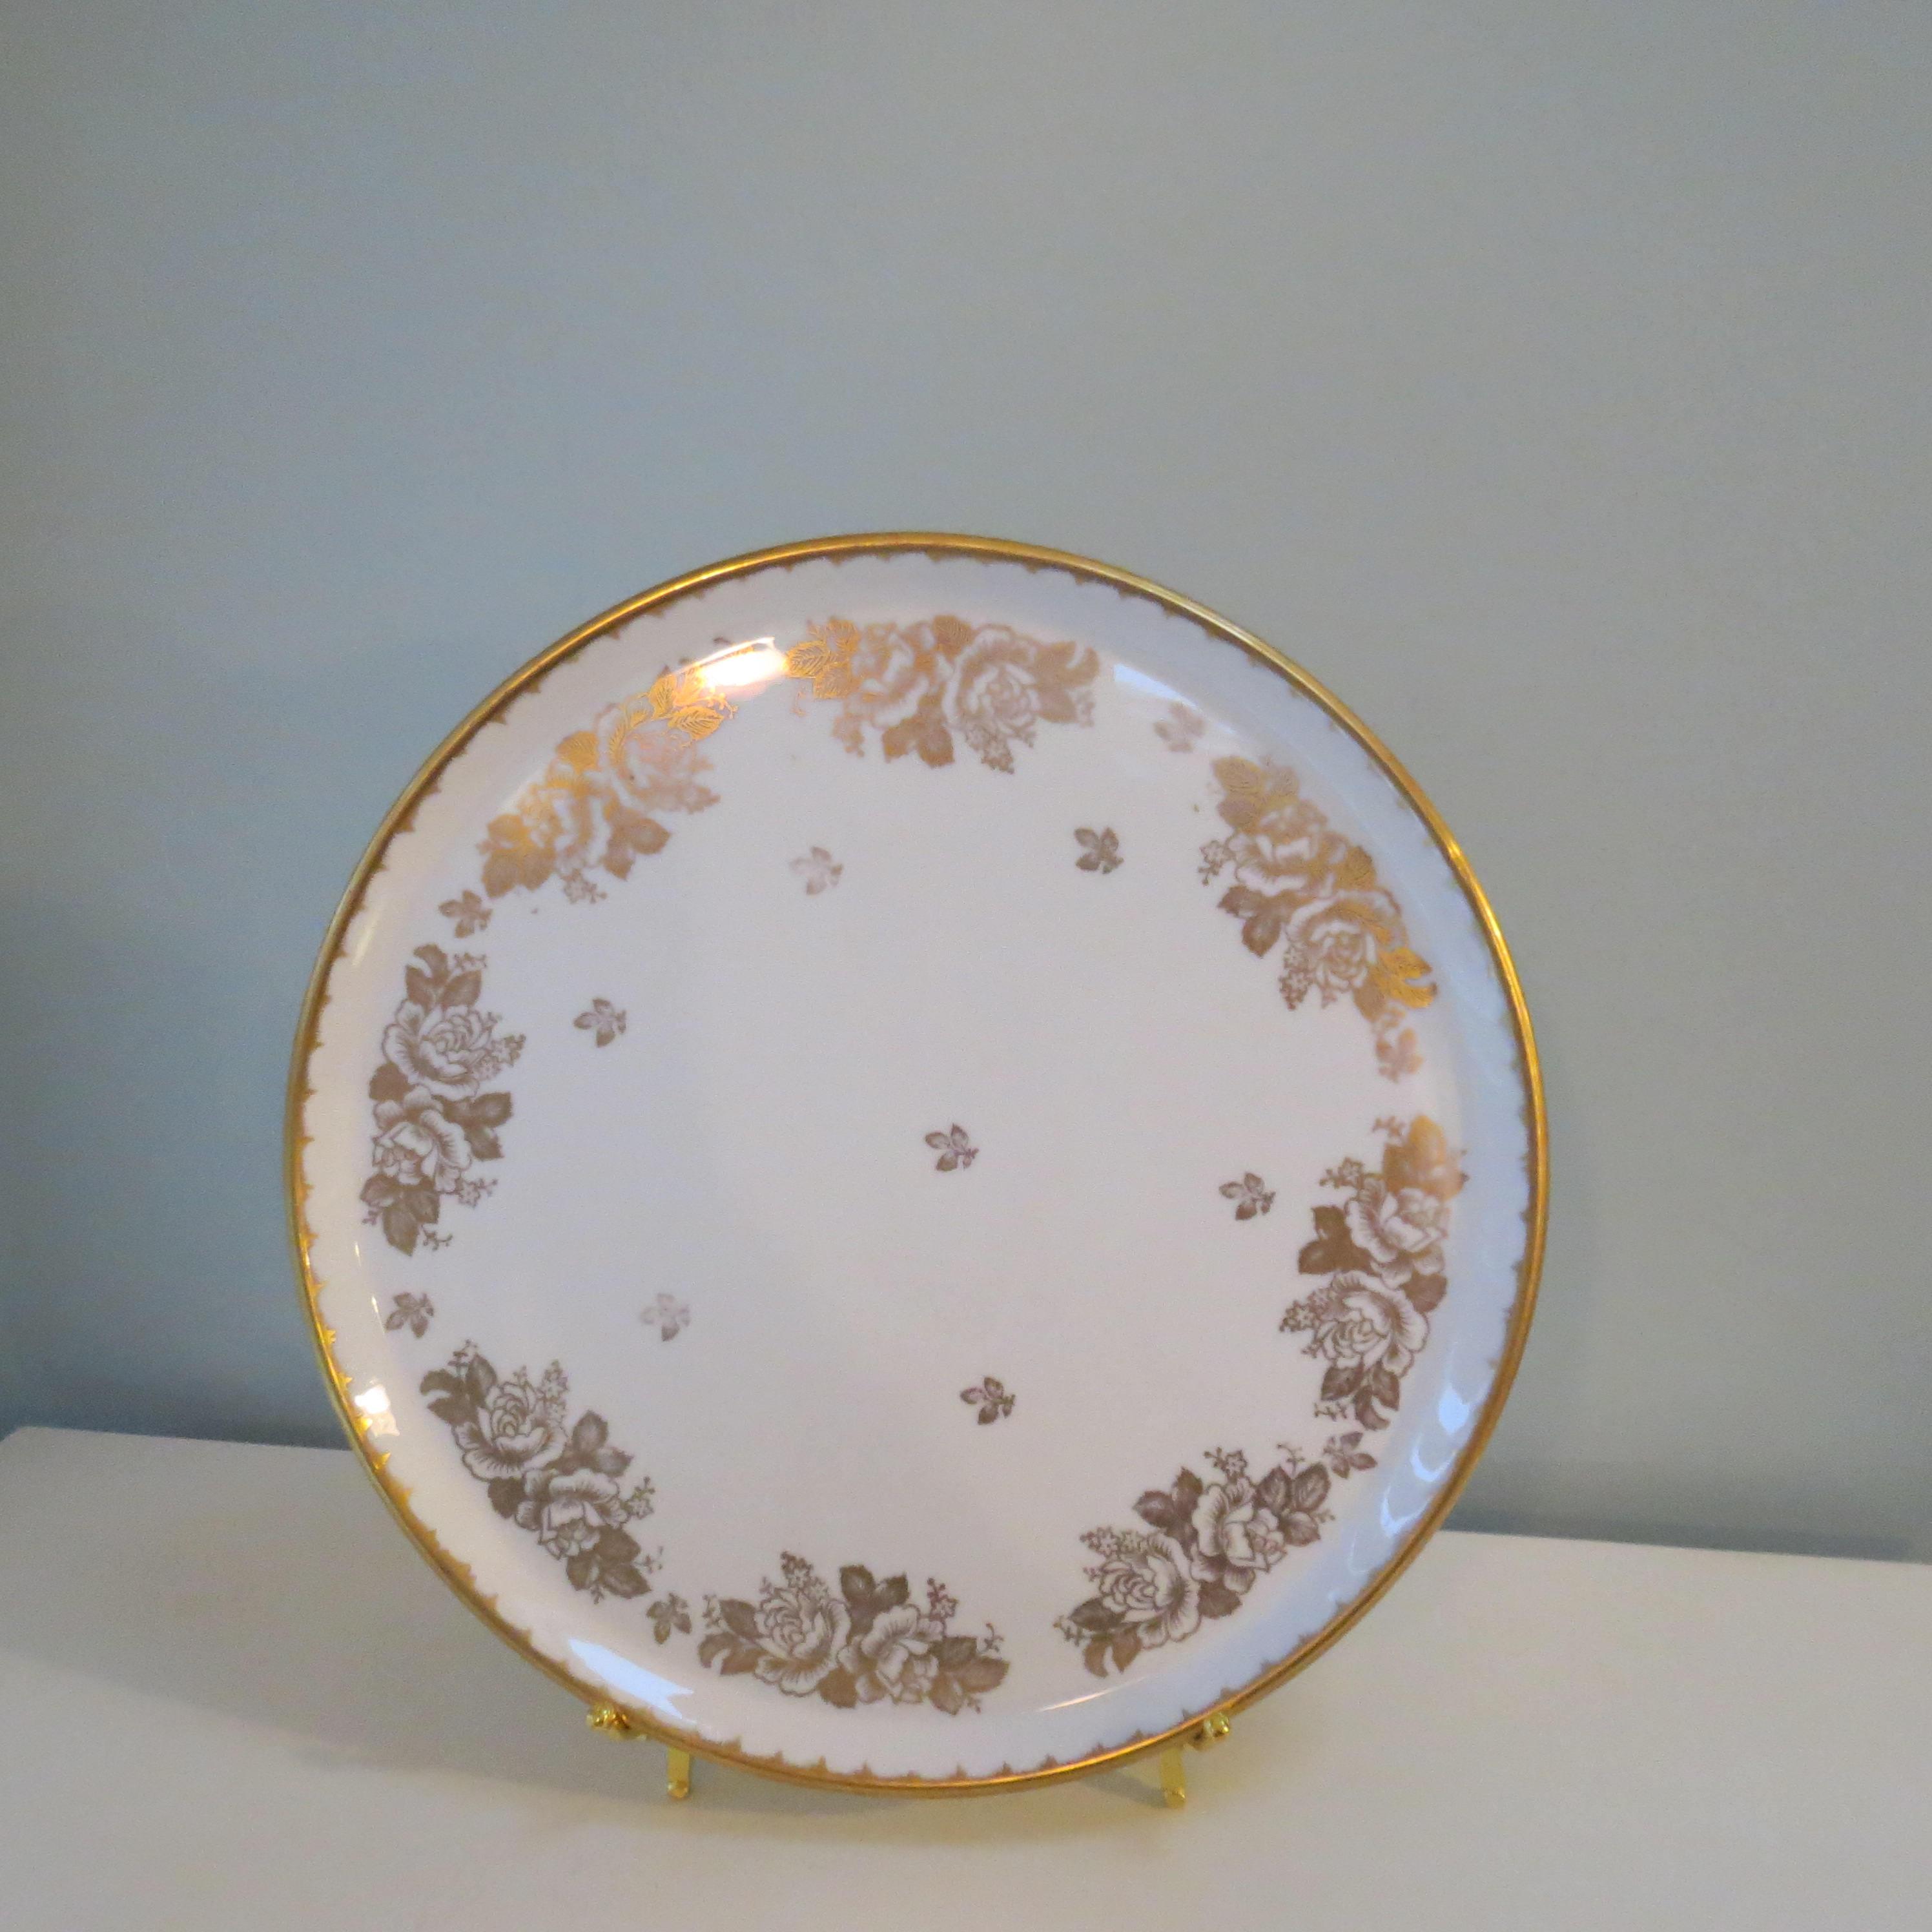 Image 1 of Antique Revol Porcelain China Plate